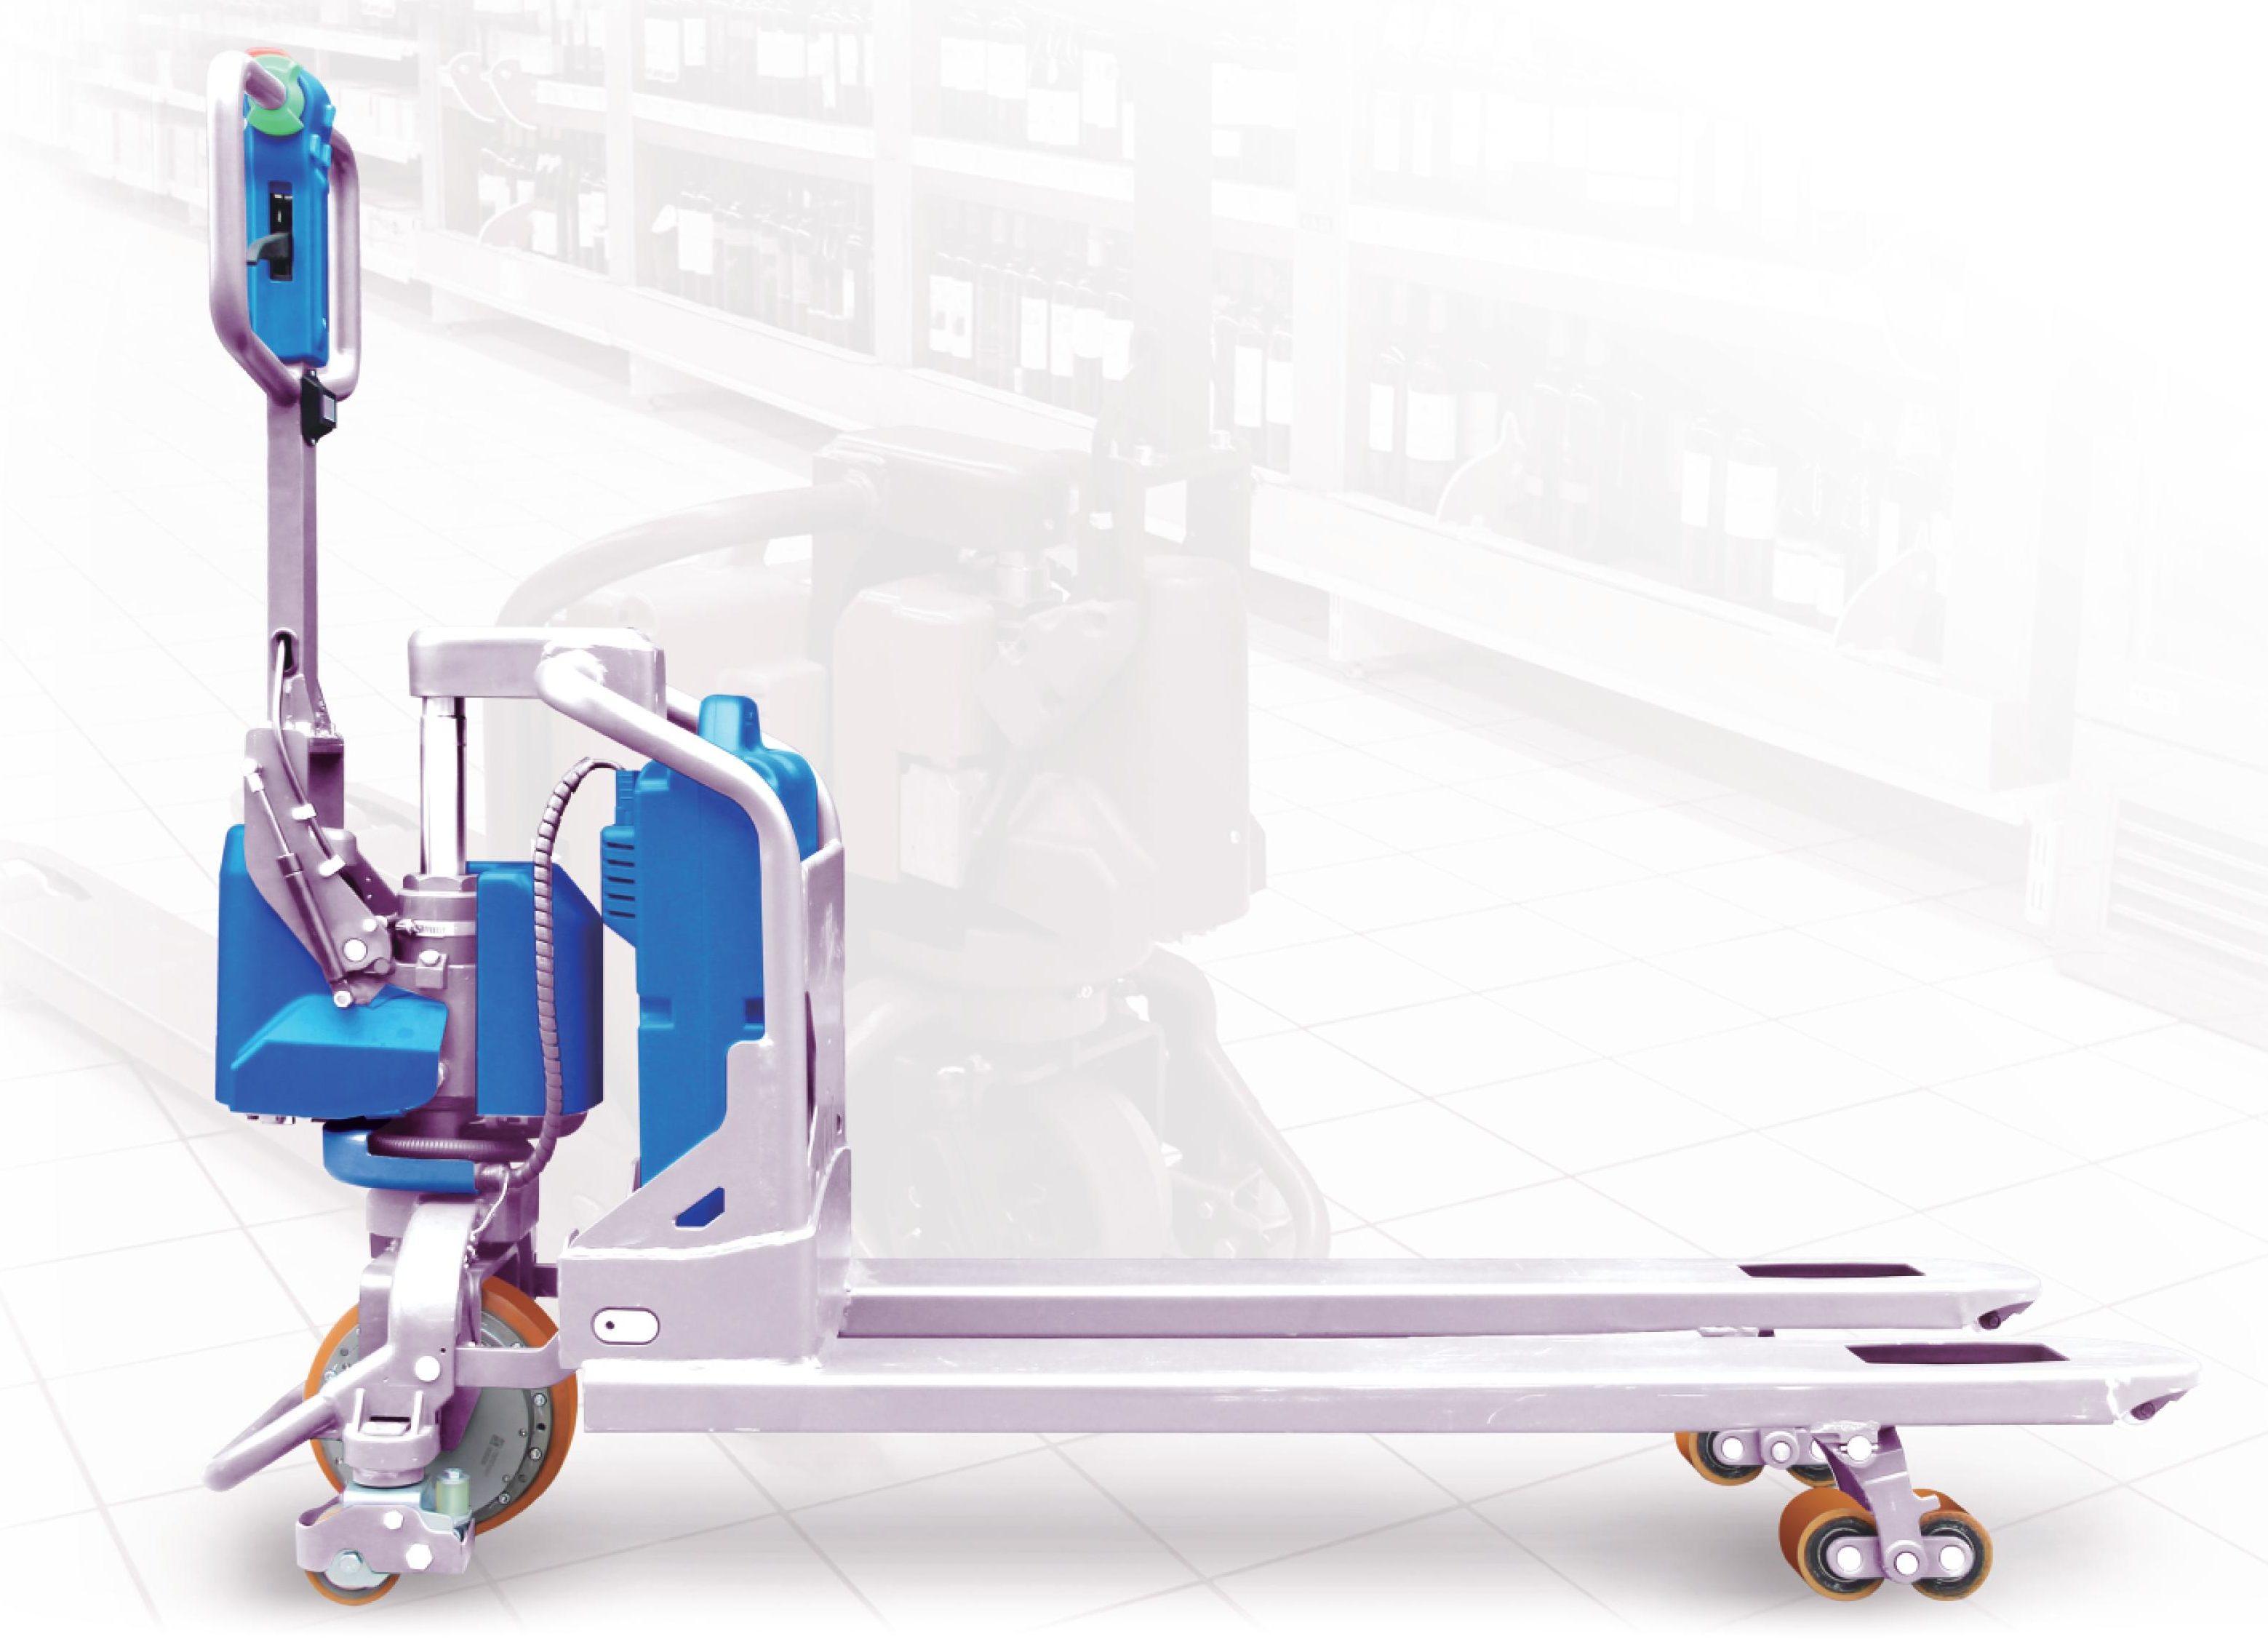 Axon Electric Pallet Truck SPE15X / PE15X